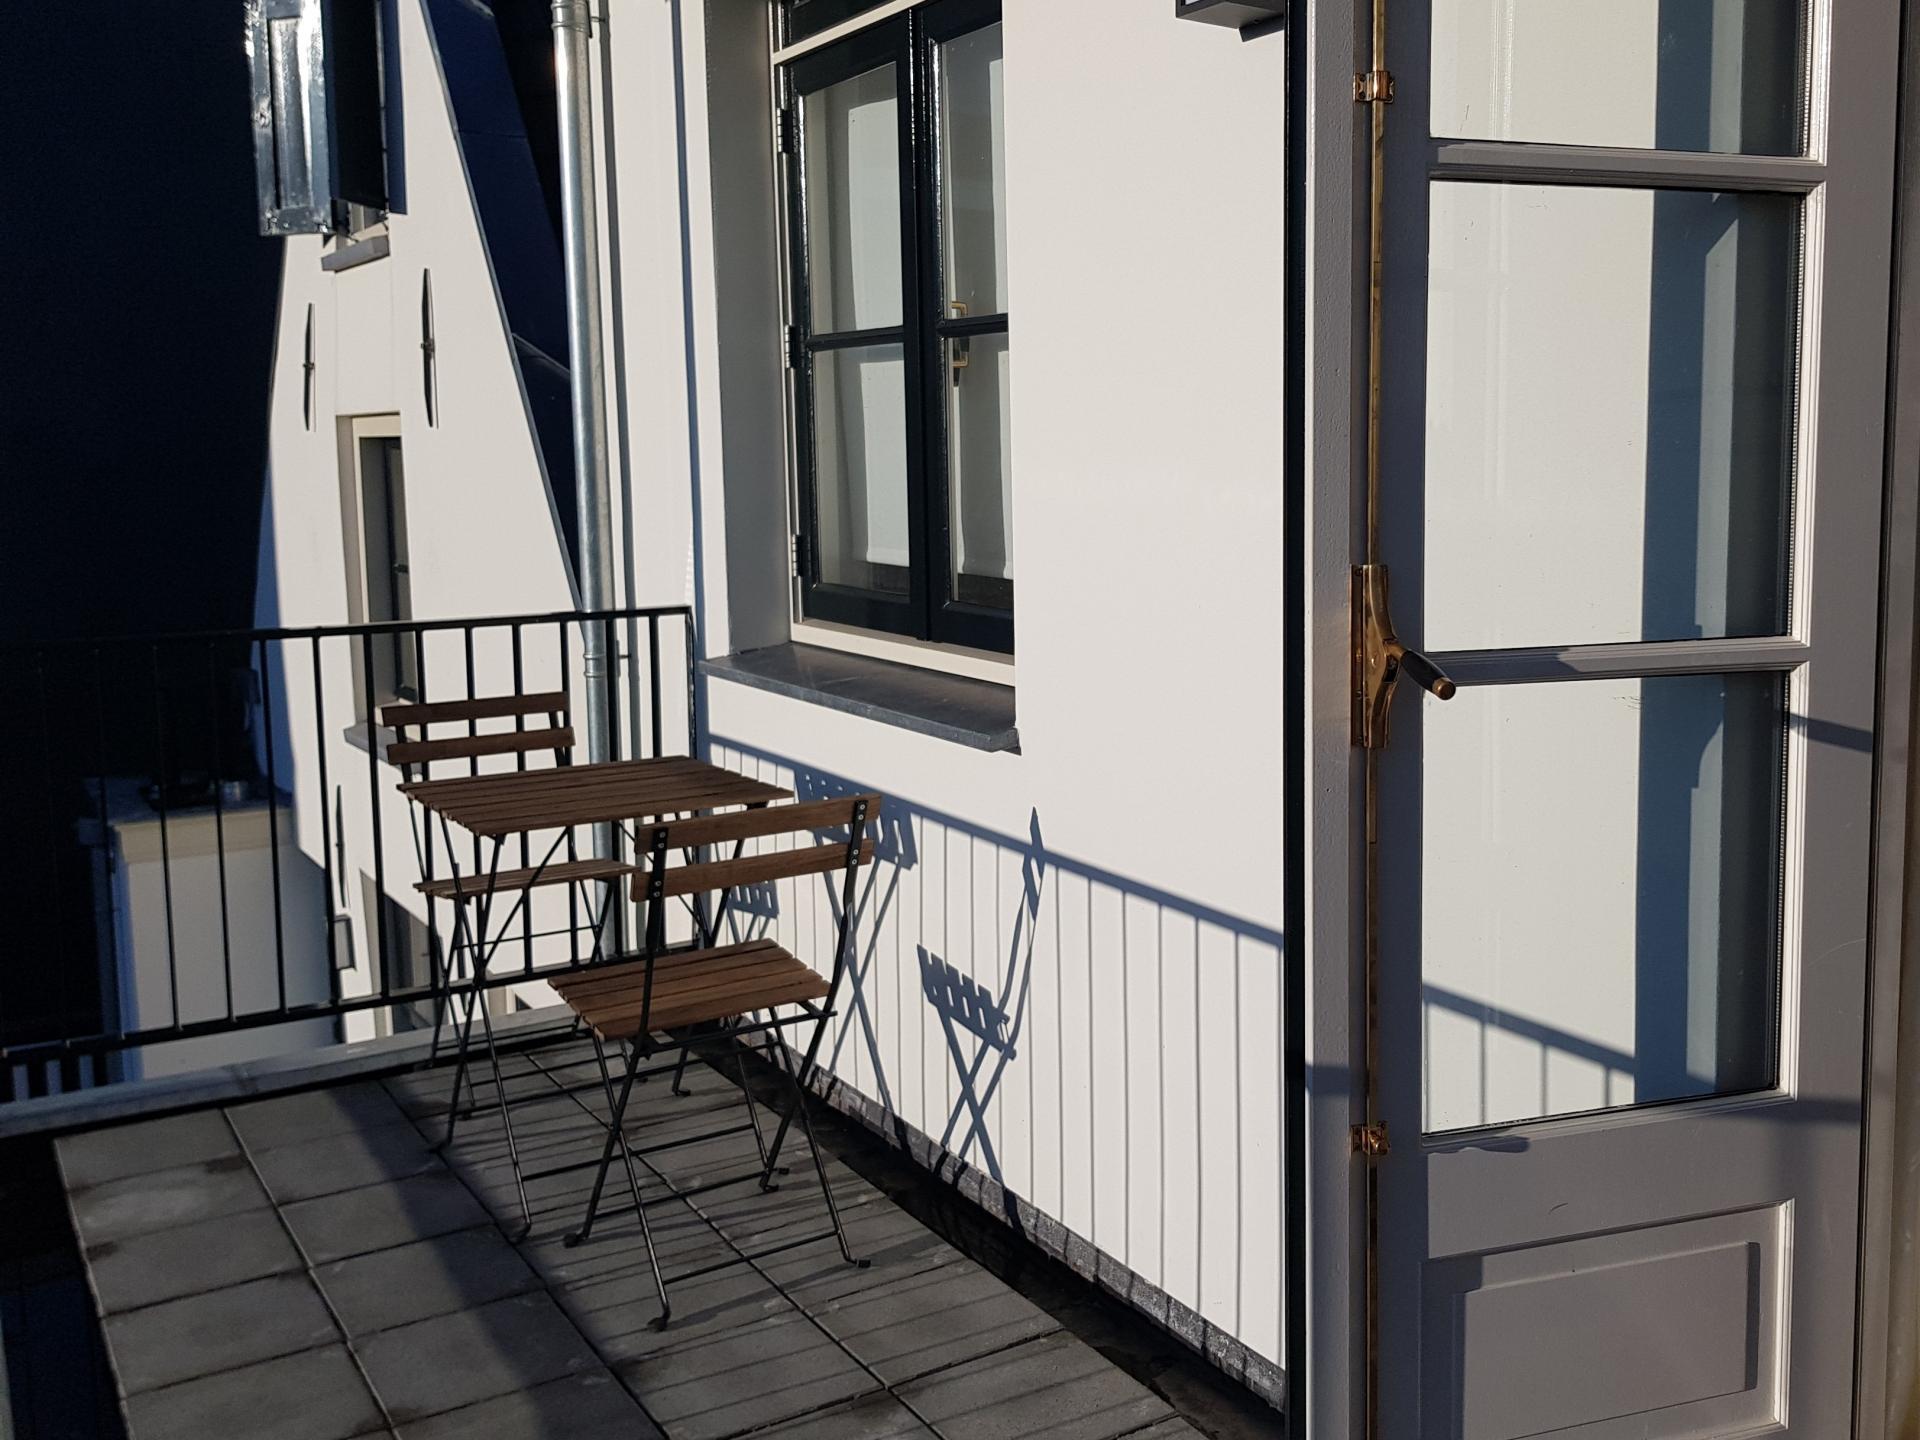 Balcony at 21 Haarlemmerplein Apartments, Amsterdam